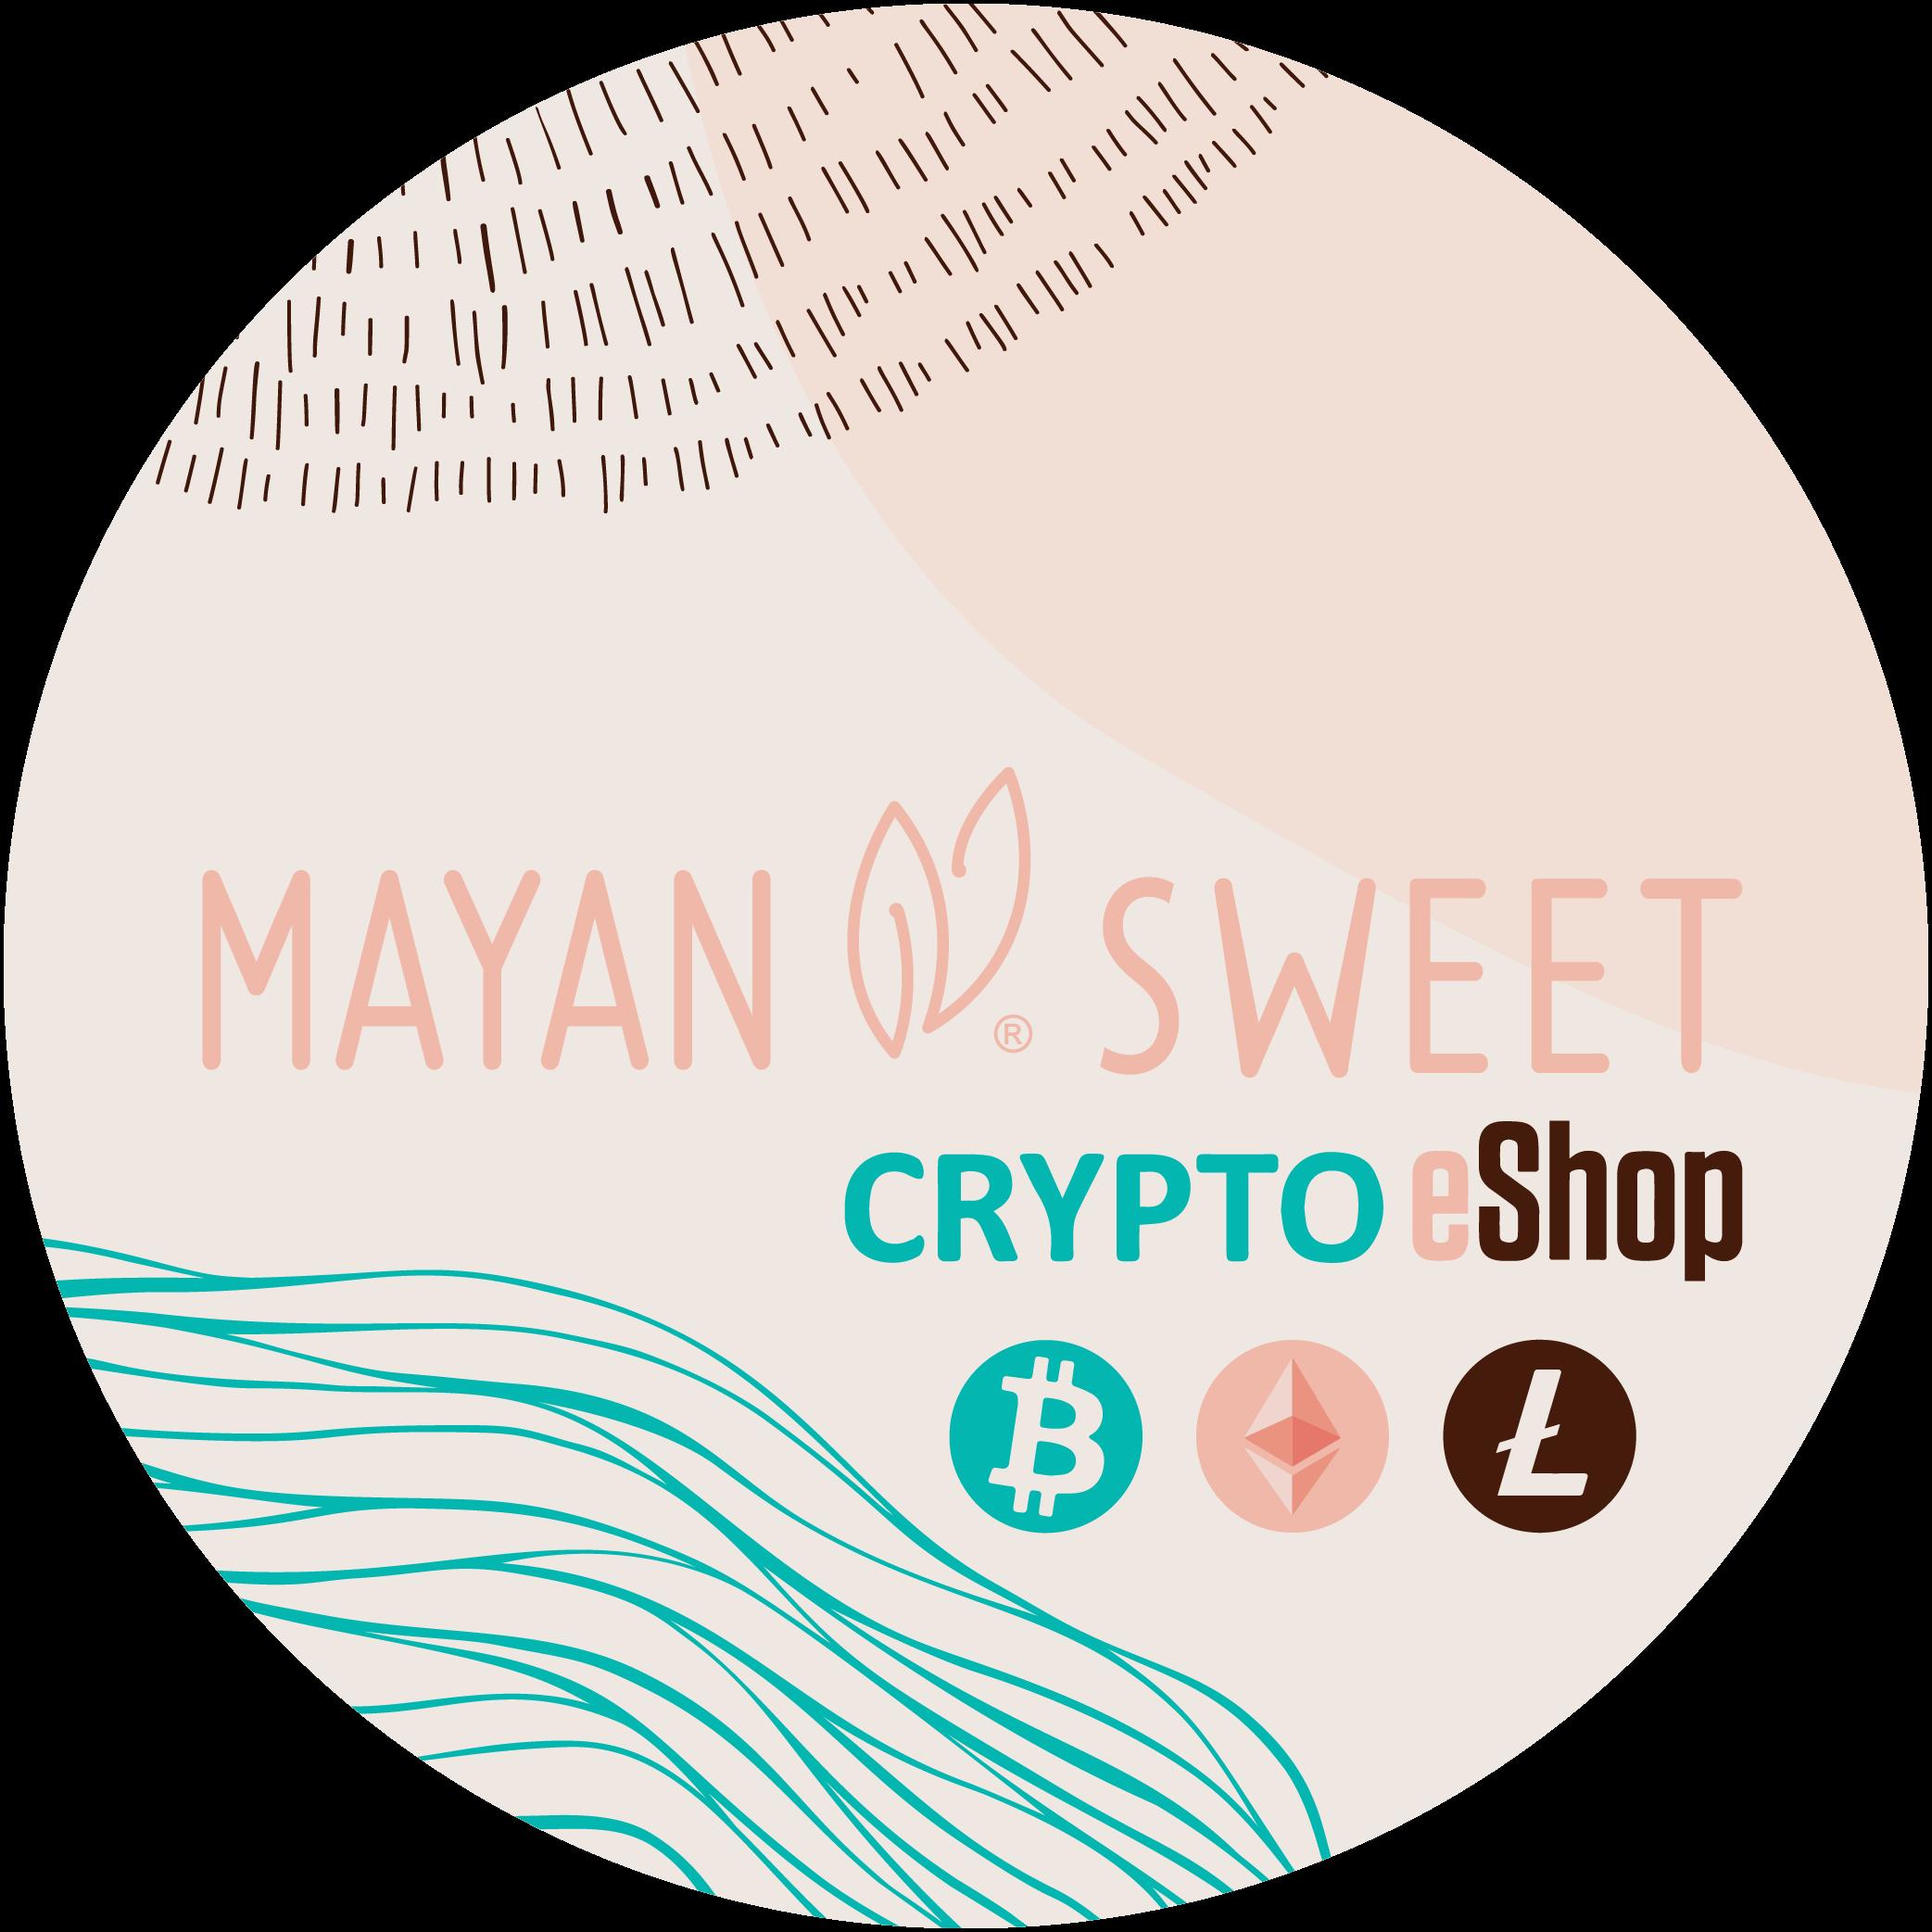 Mayan Sweet Crypto Eshop